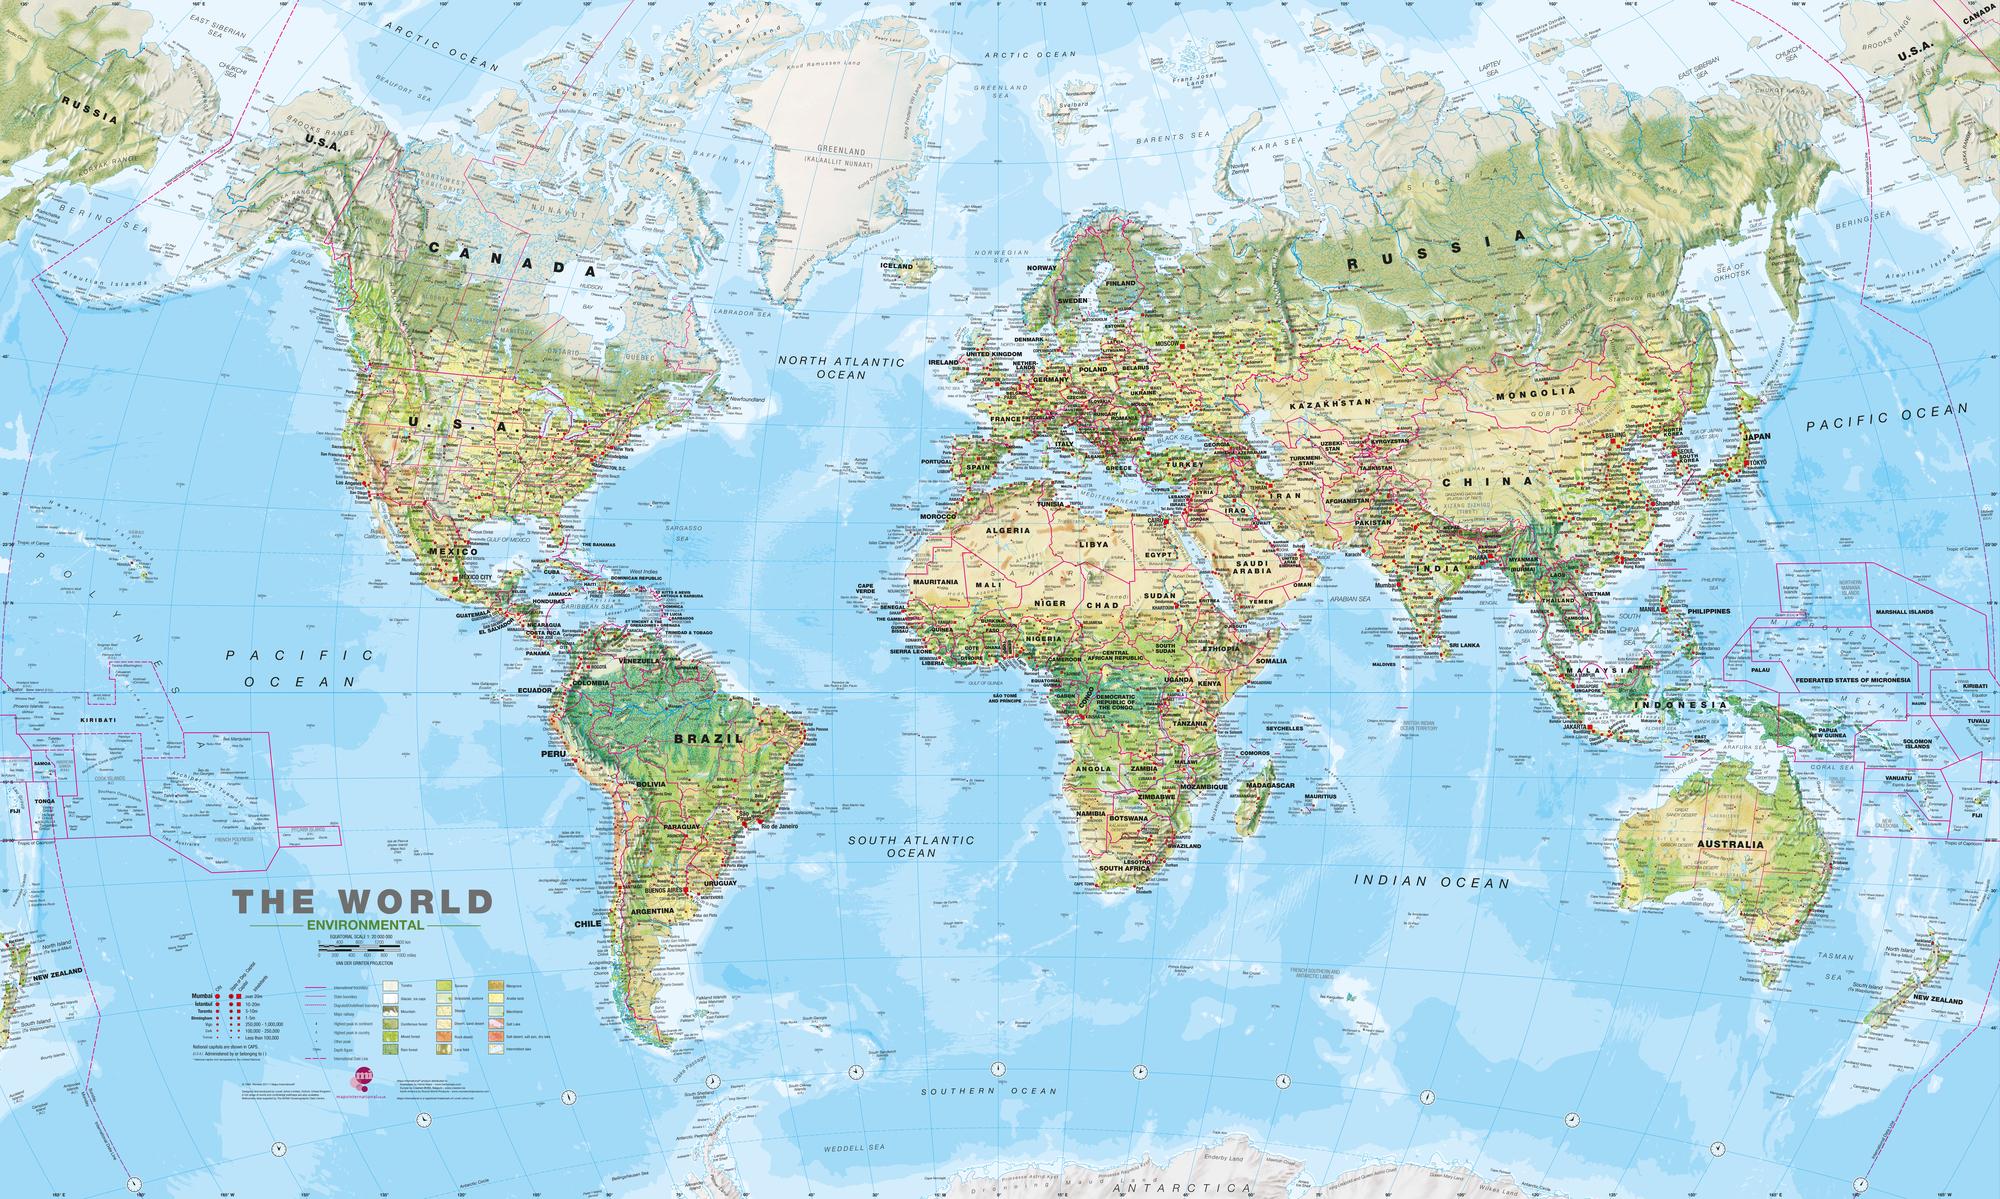 World Environmental Map